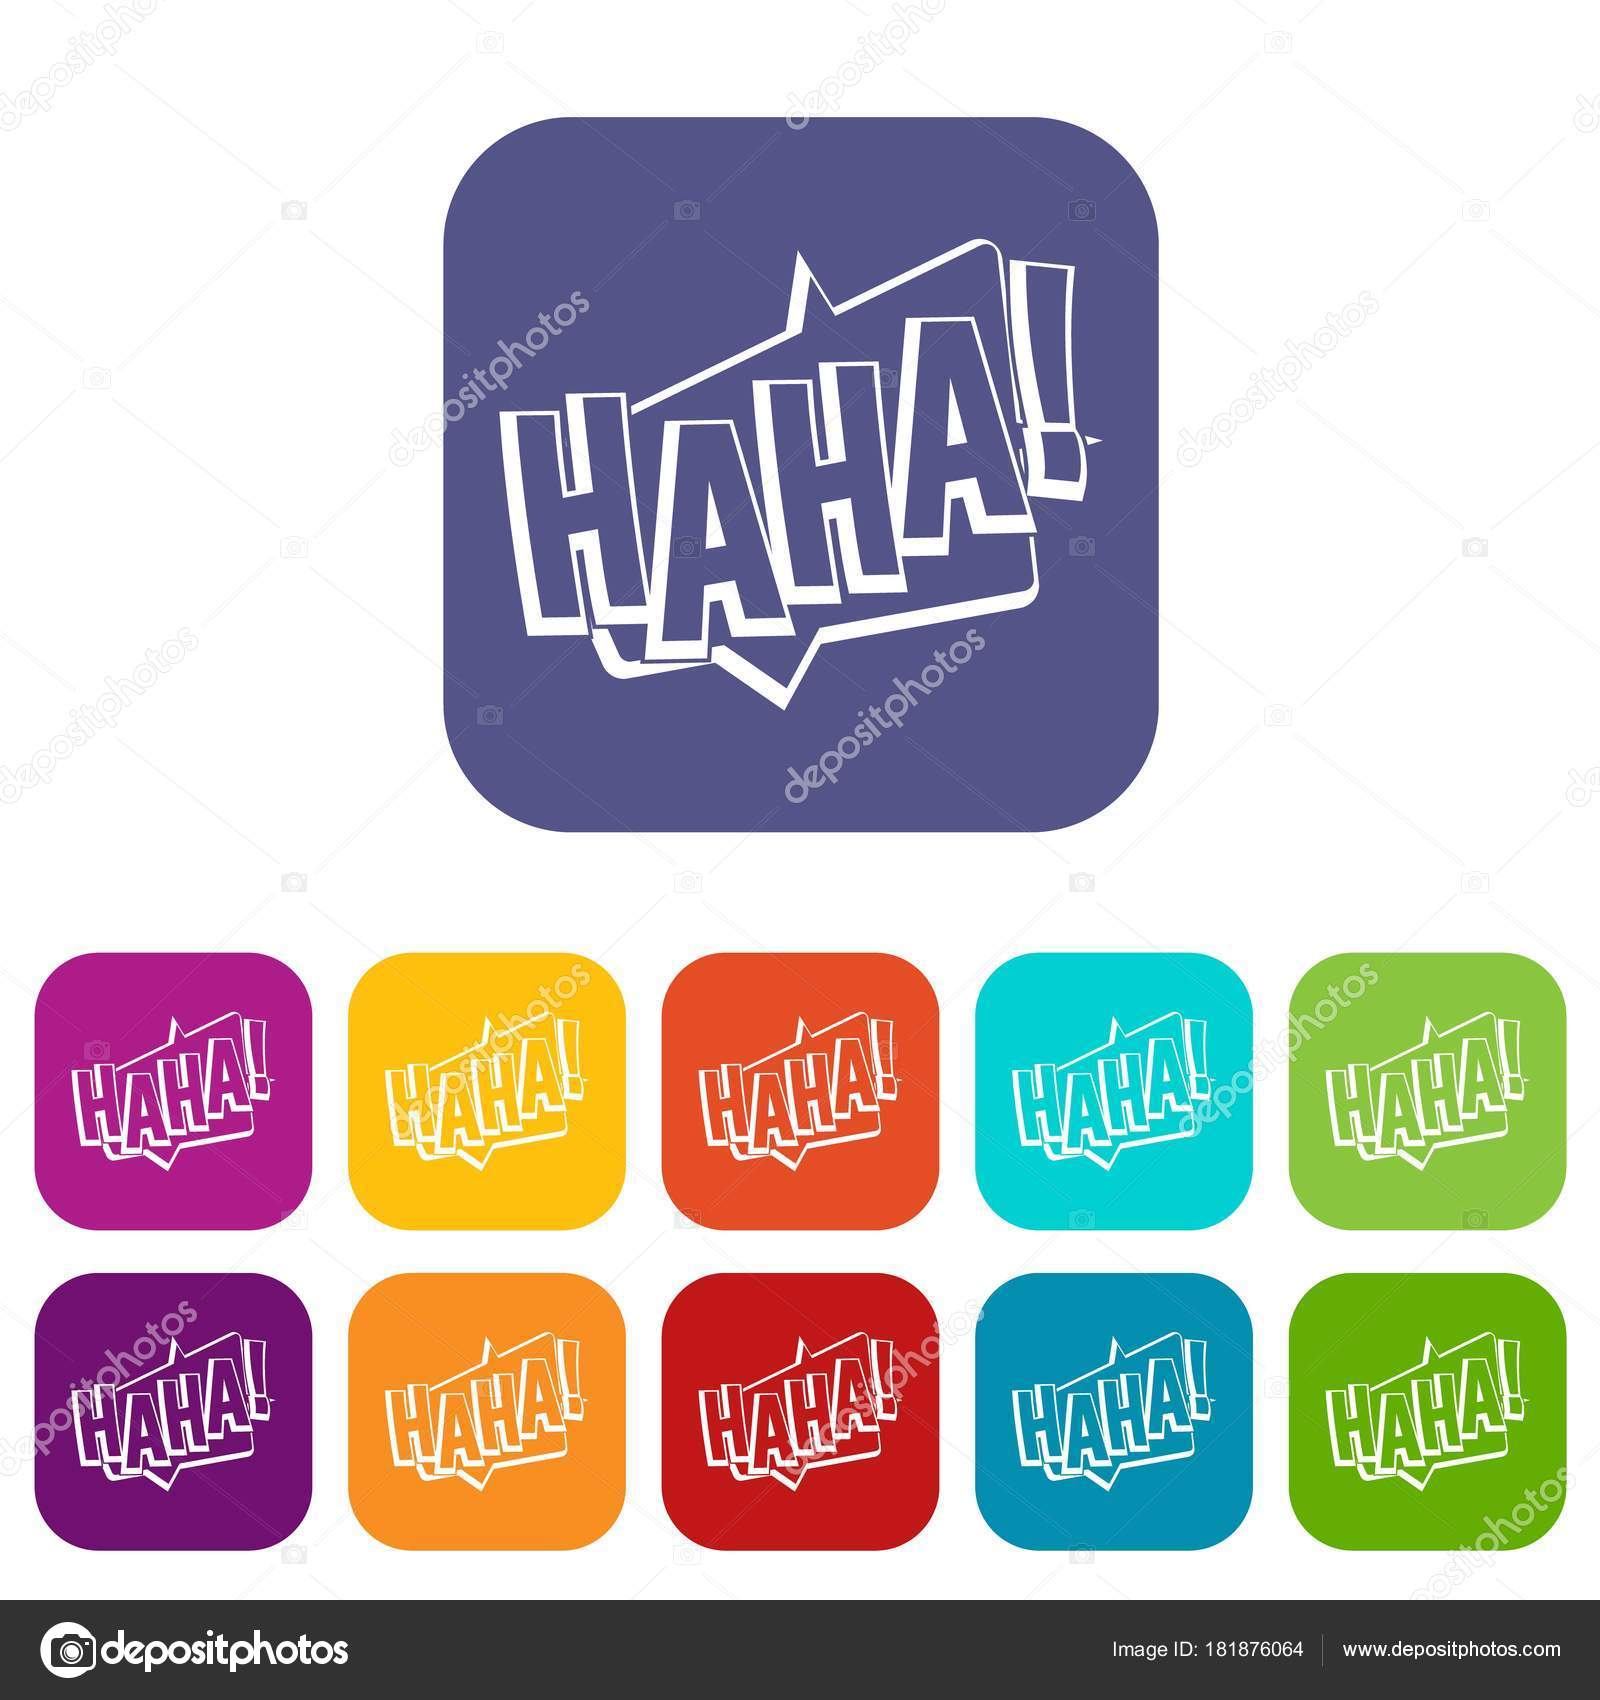 HAHA, comic text sound effect icons set flat — Stock Vector